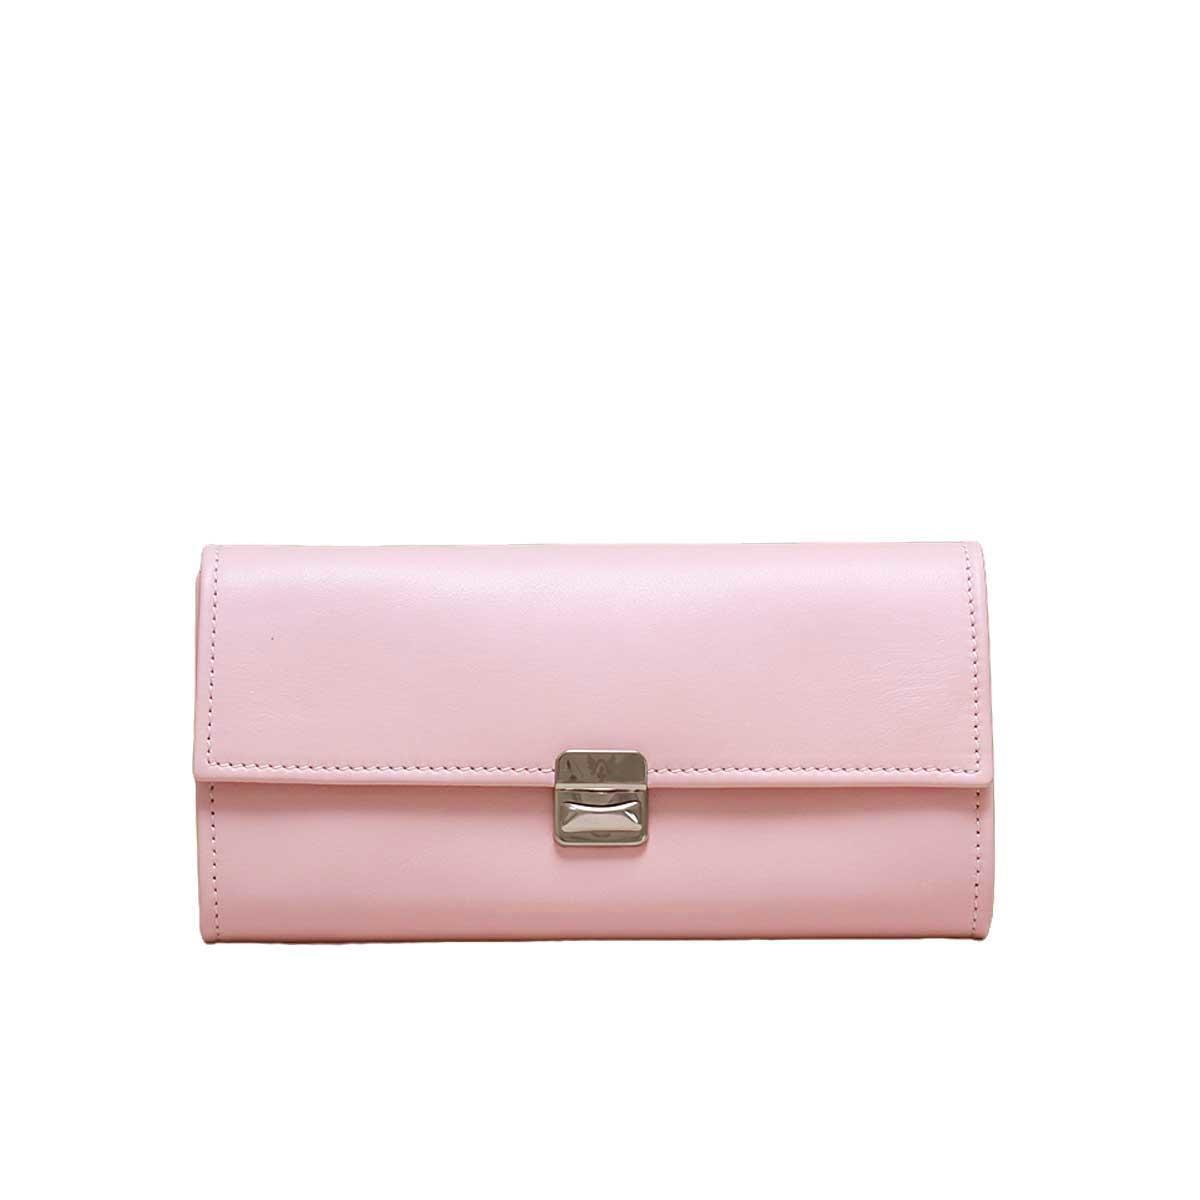 Extra grosse Leder Geldbörse Hellrosa Rosa XL